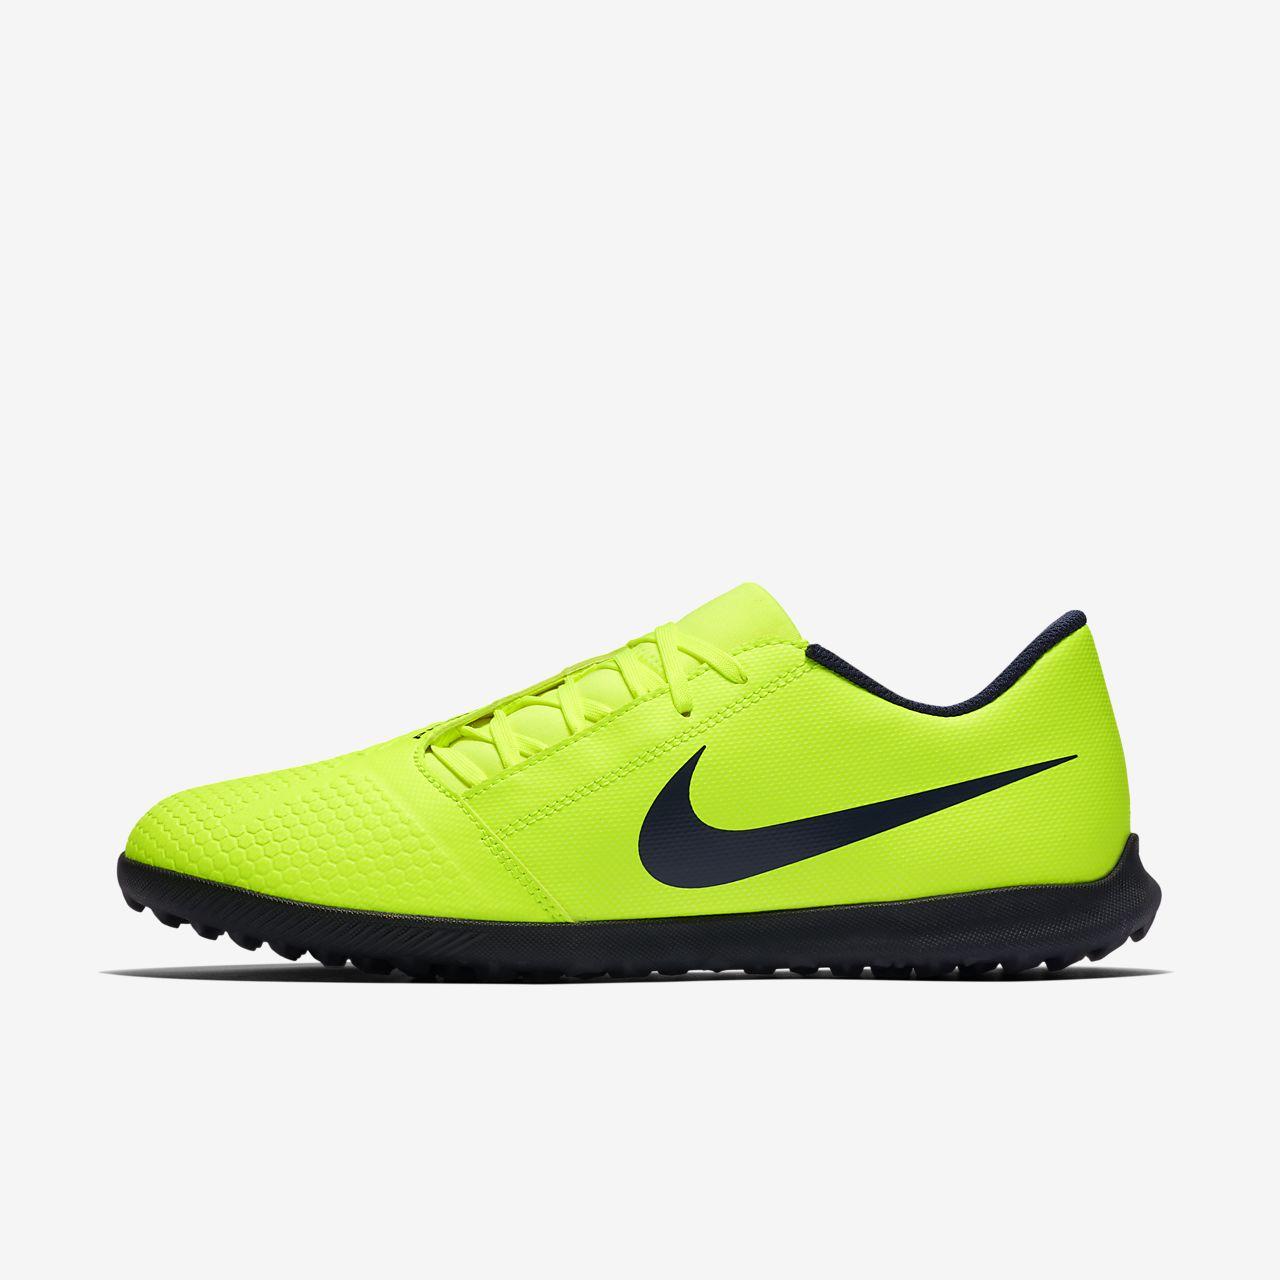 Nike PhantomVNM Club TF-fodboldsko til grus